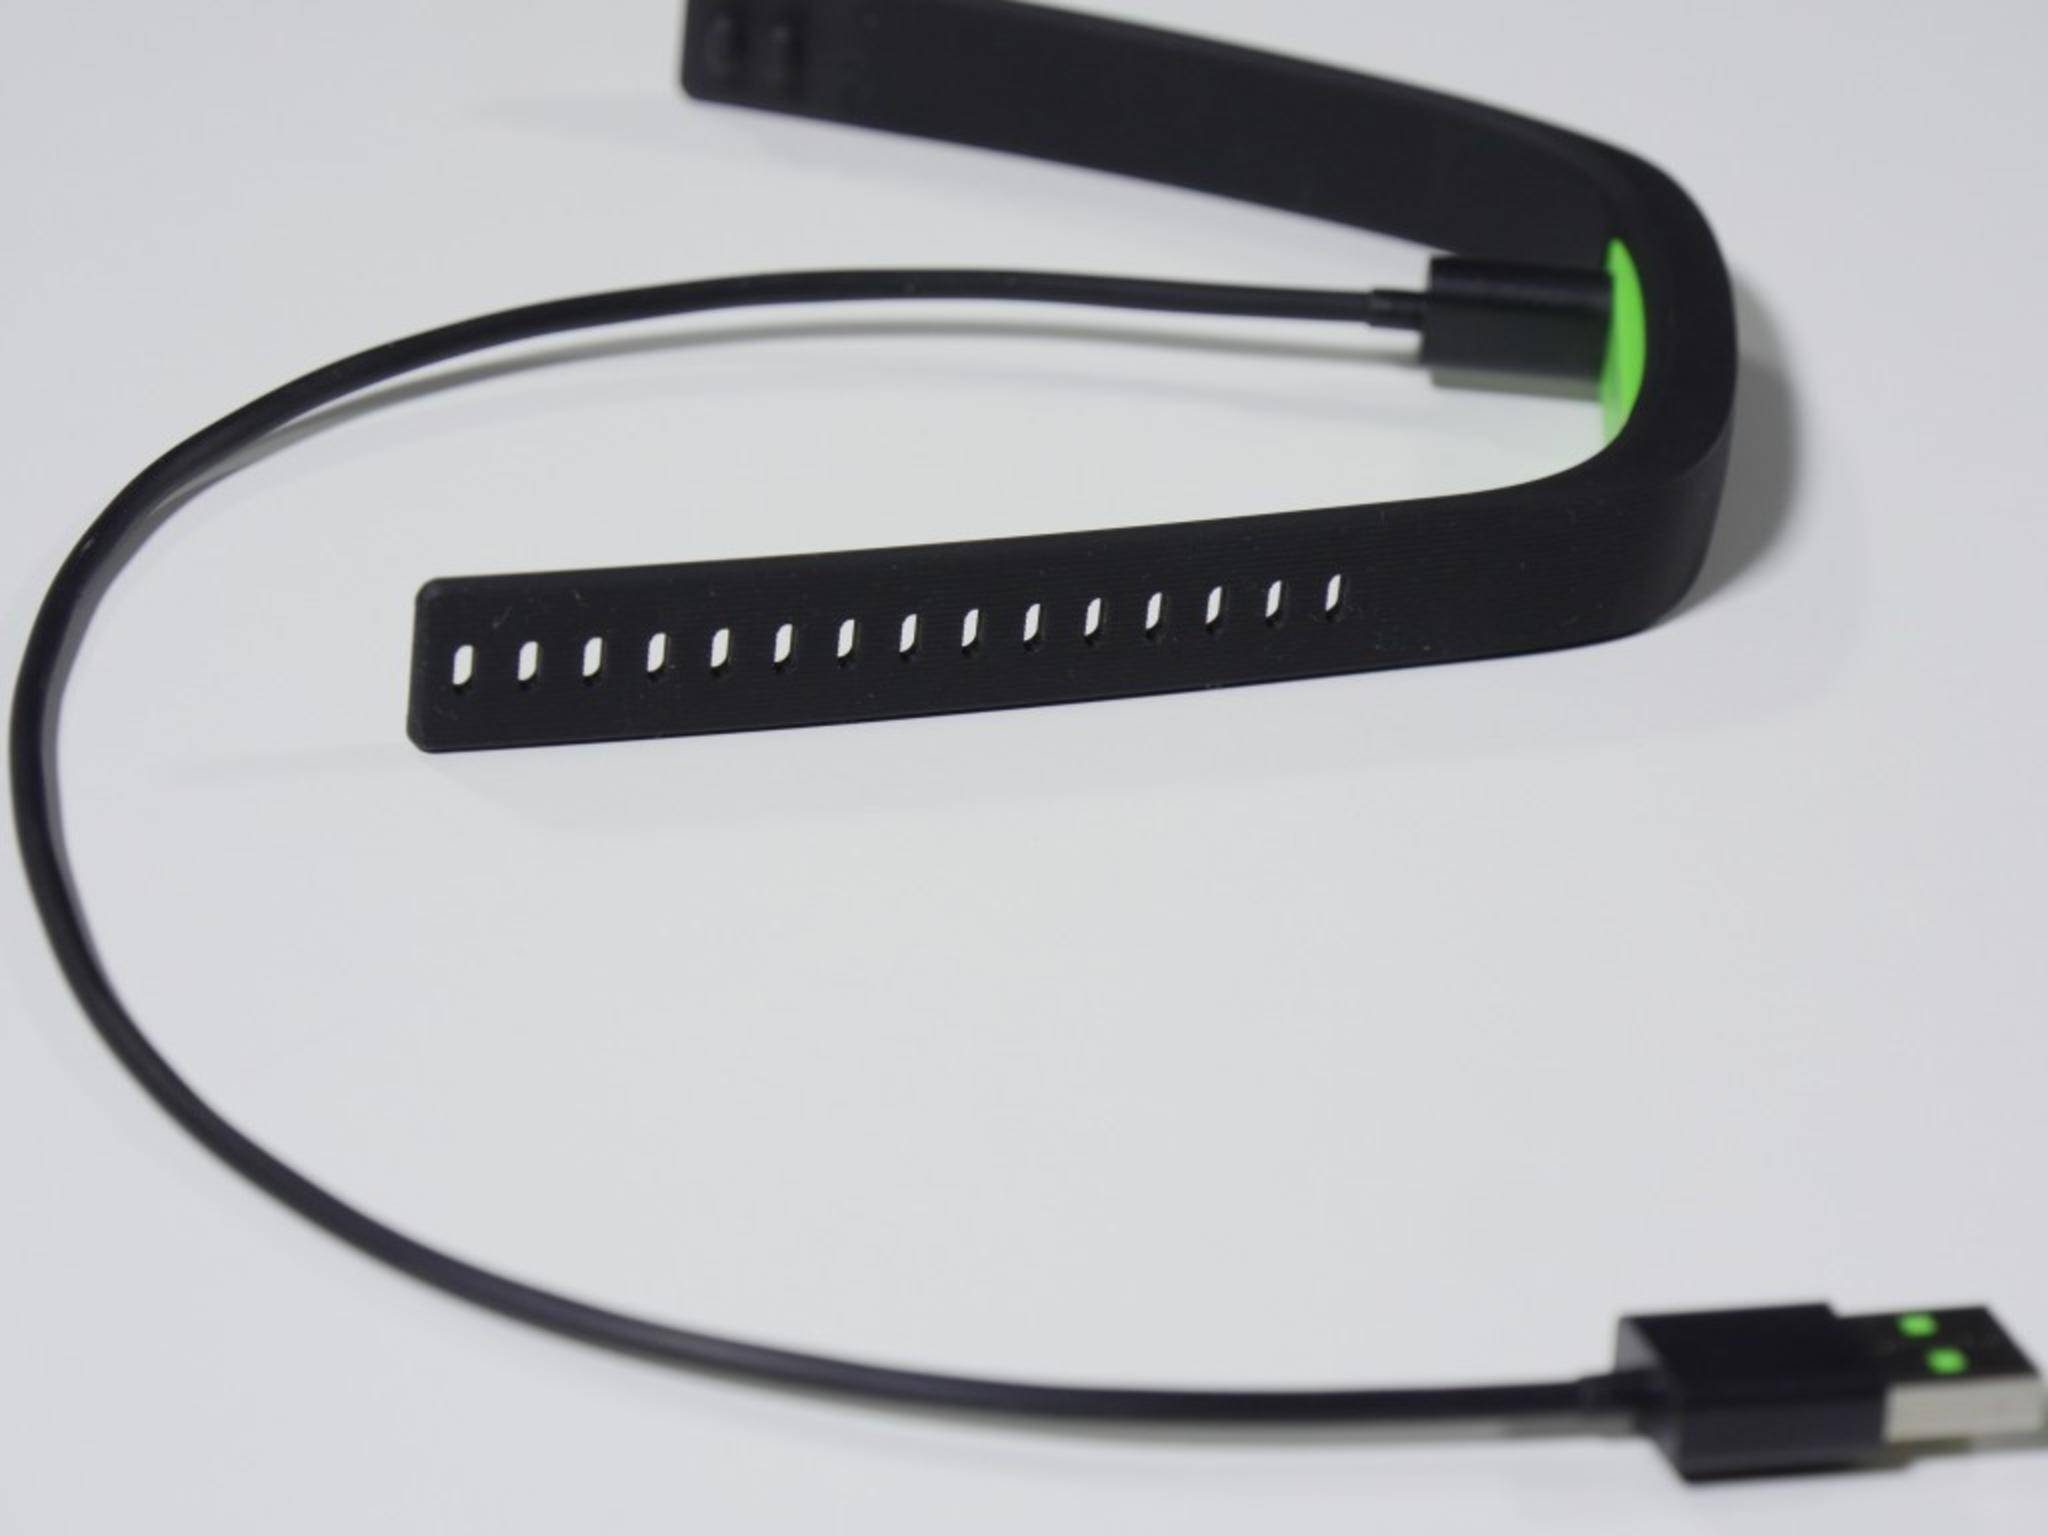 Das beiliegende USB-Ladekabel ist leider recht kurz.